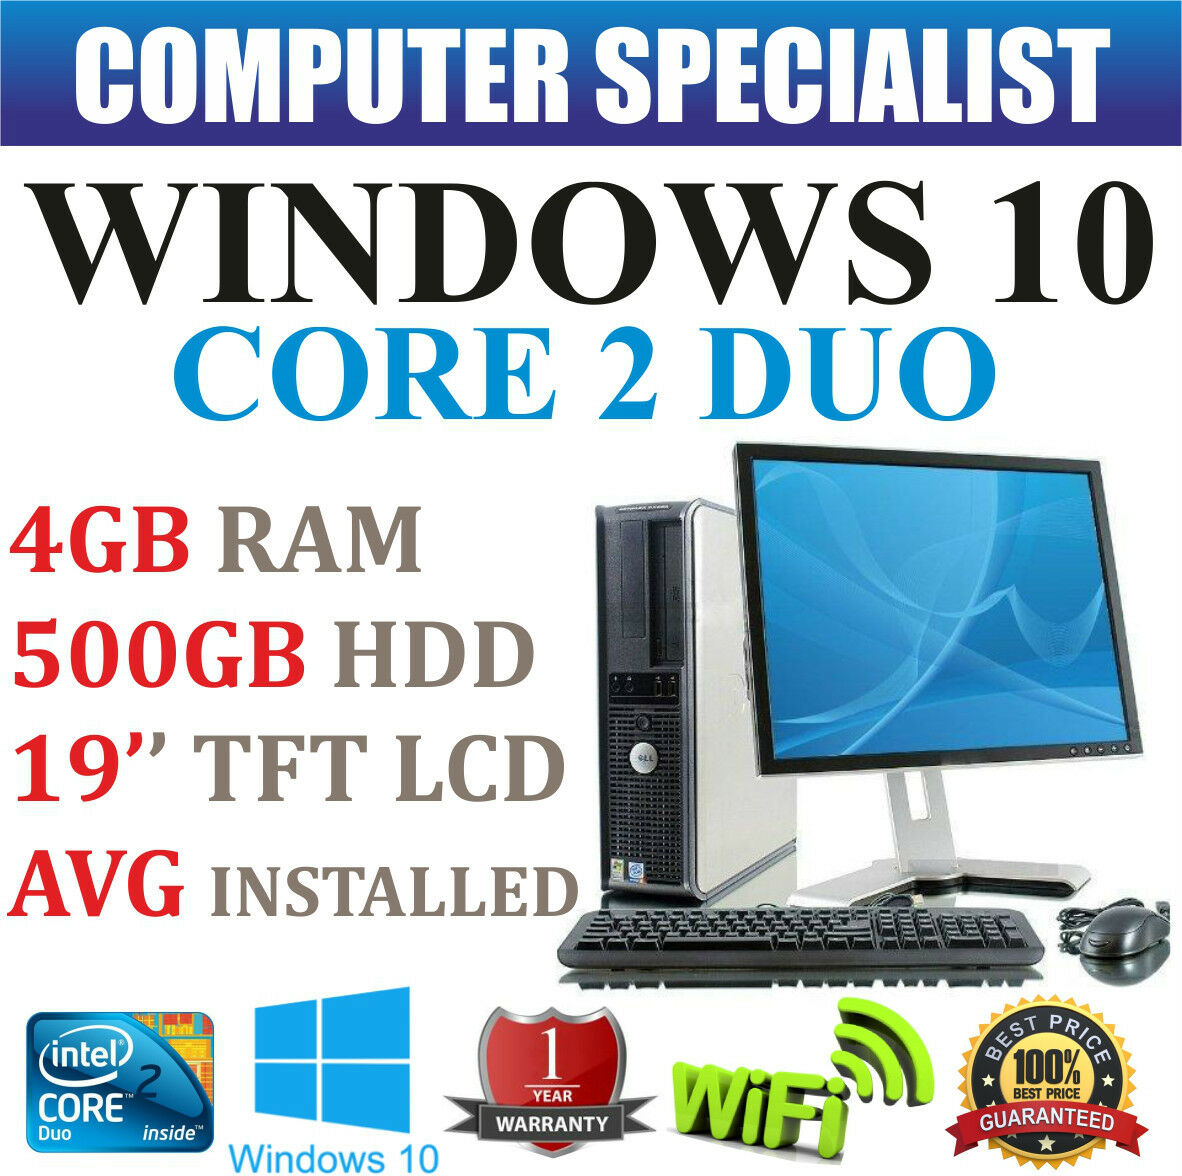 WINDOWS 10 SISTEMA COMPLETO COMPUTER DESKTOP PC CORE 2 DUO 3.00GHz 4GB RAM